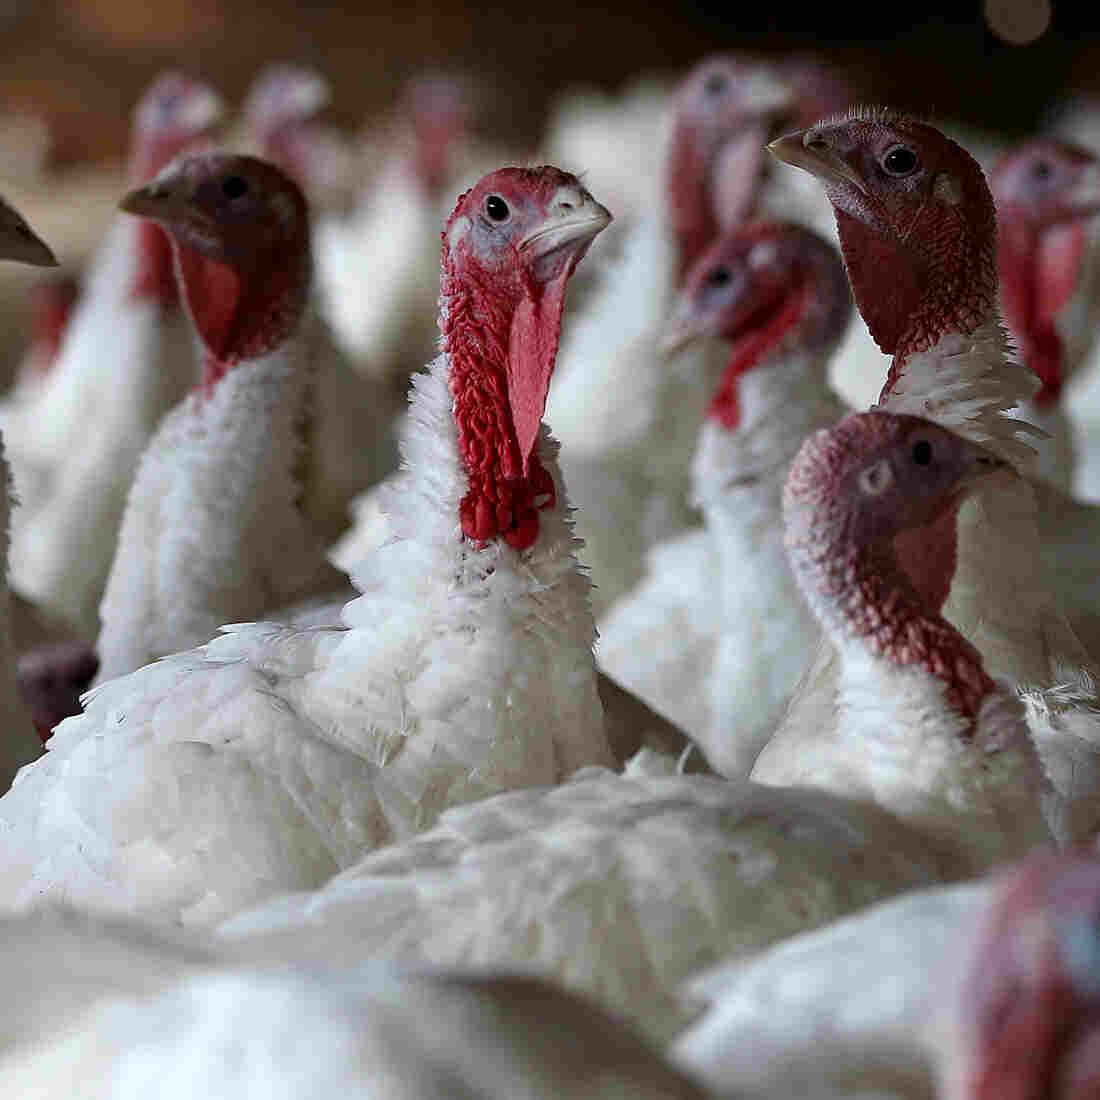 Did Your Thanksgiving Turkey Take Any Antibiotics?